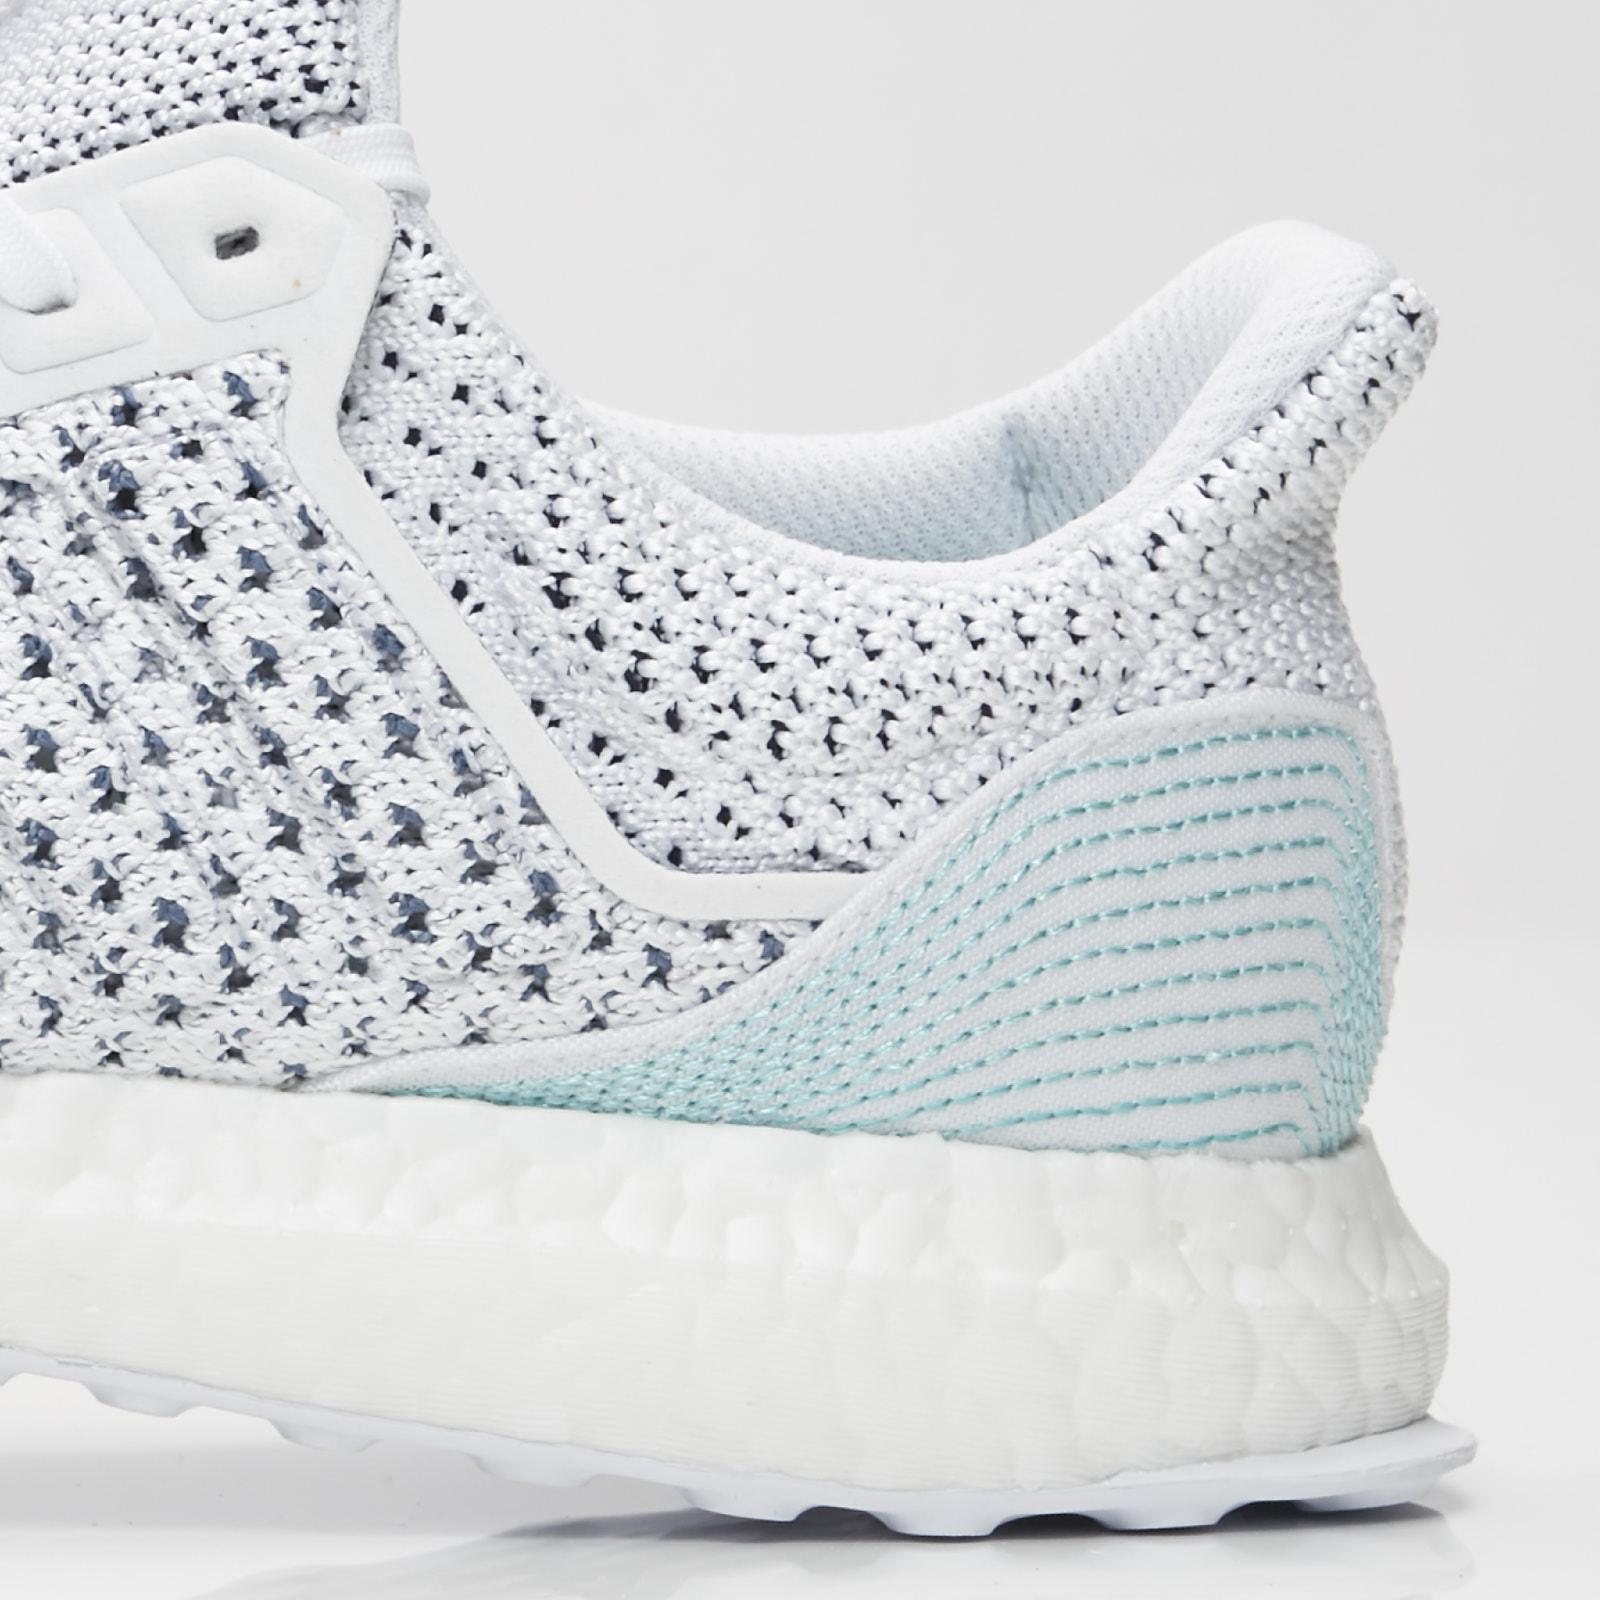 promo code 51fc2 cbcb8 adidas Ultraboost Parley Ltd - Bb7076 - Sneakersnstuff ...